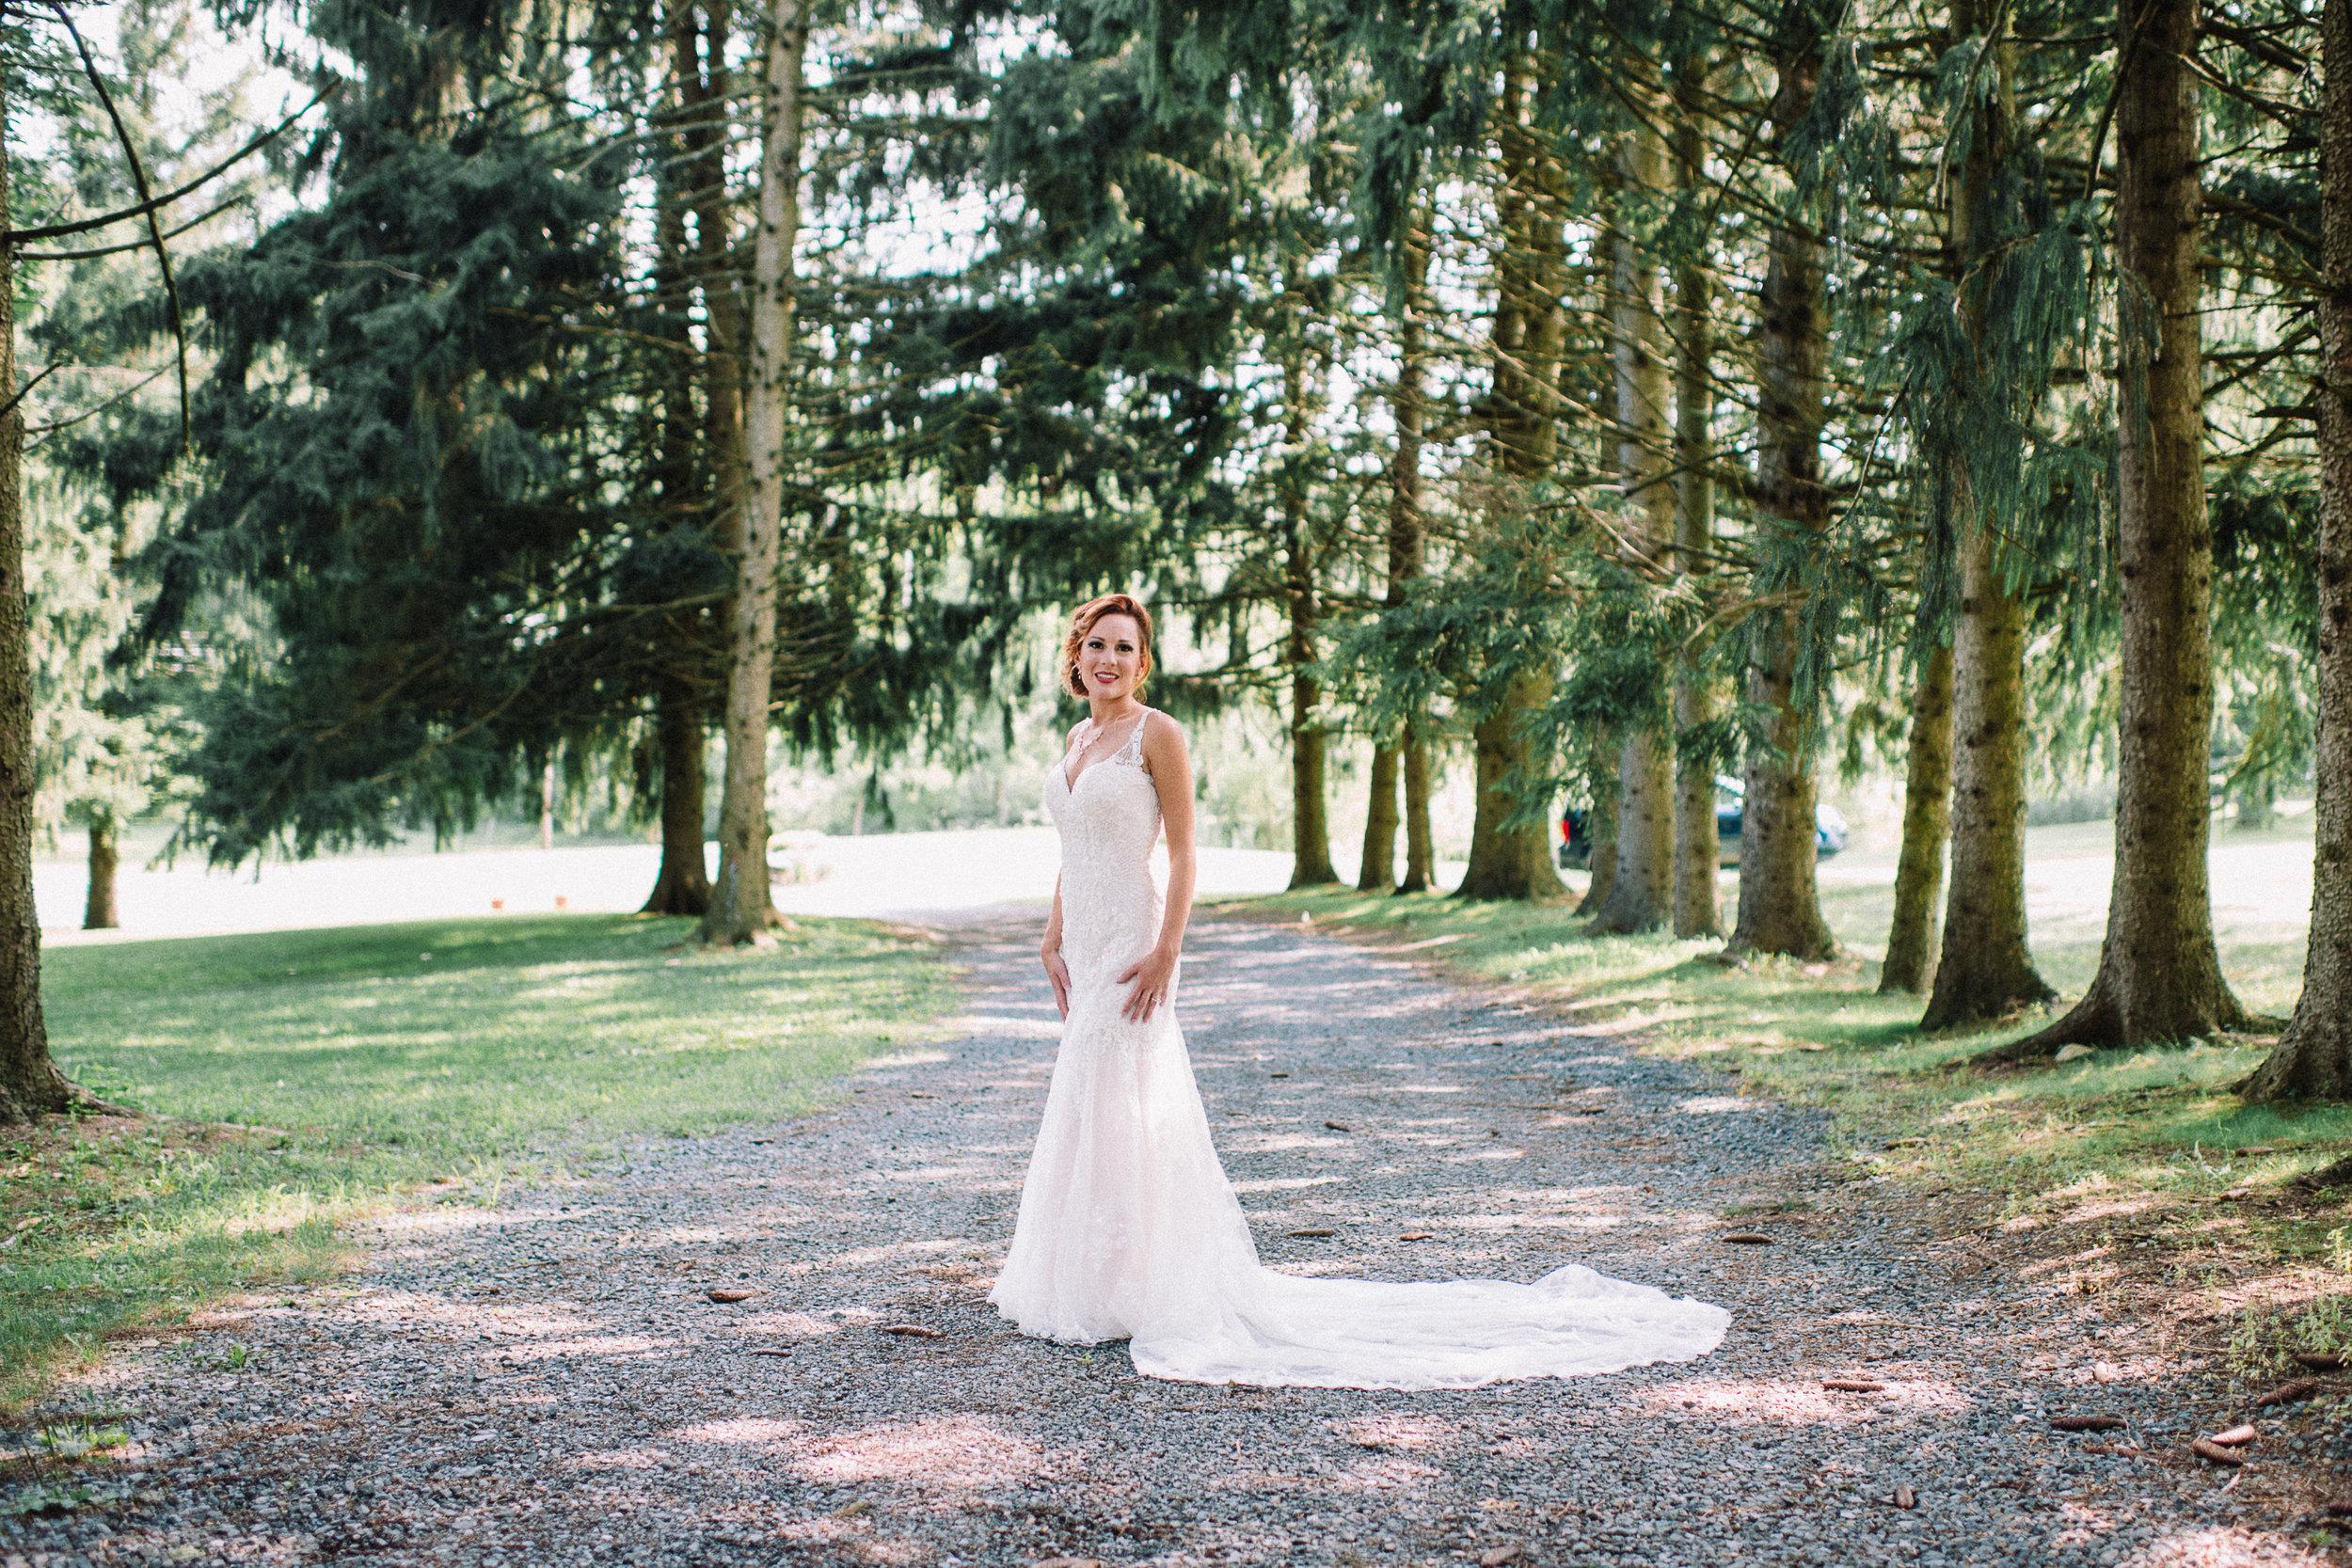 030ninalilyphoto-groveatkemptonwedding-hicksblog.jpg